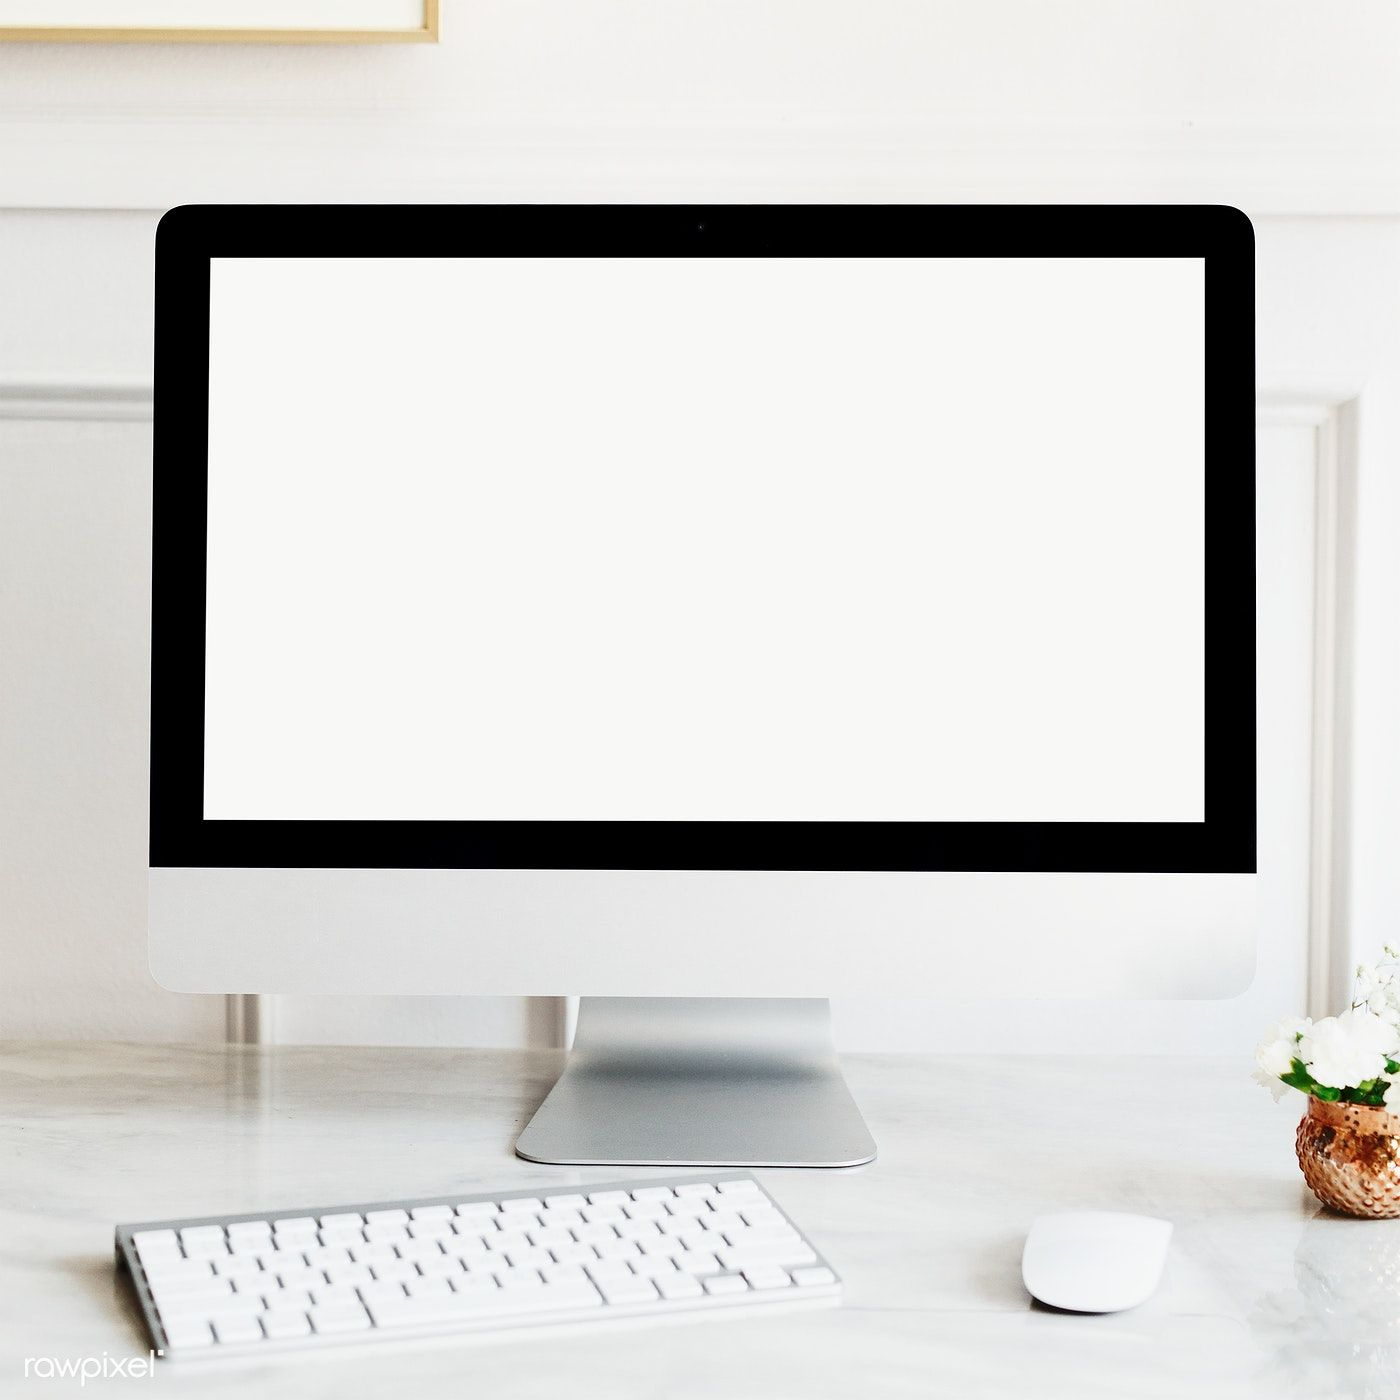 Download Premium Png Of Computer Screen Mockup Transparent Png 2024689